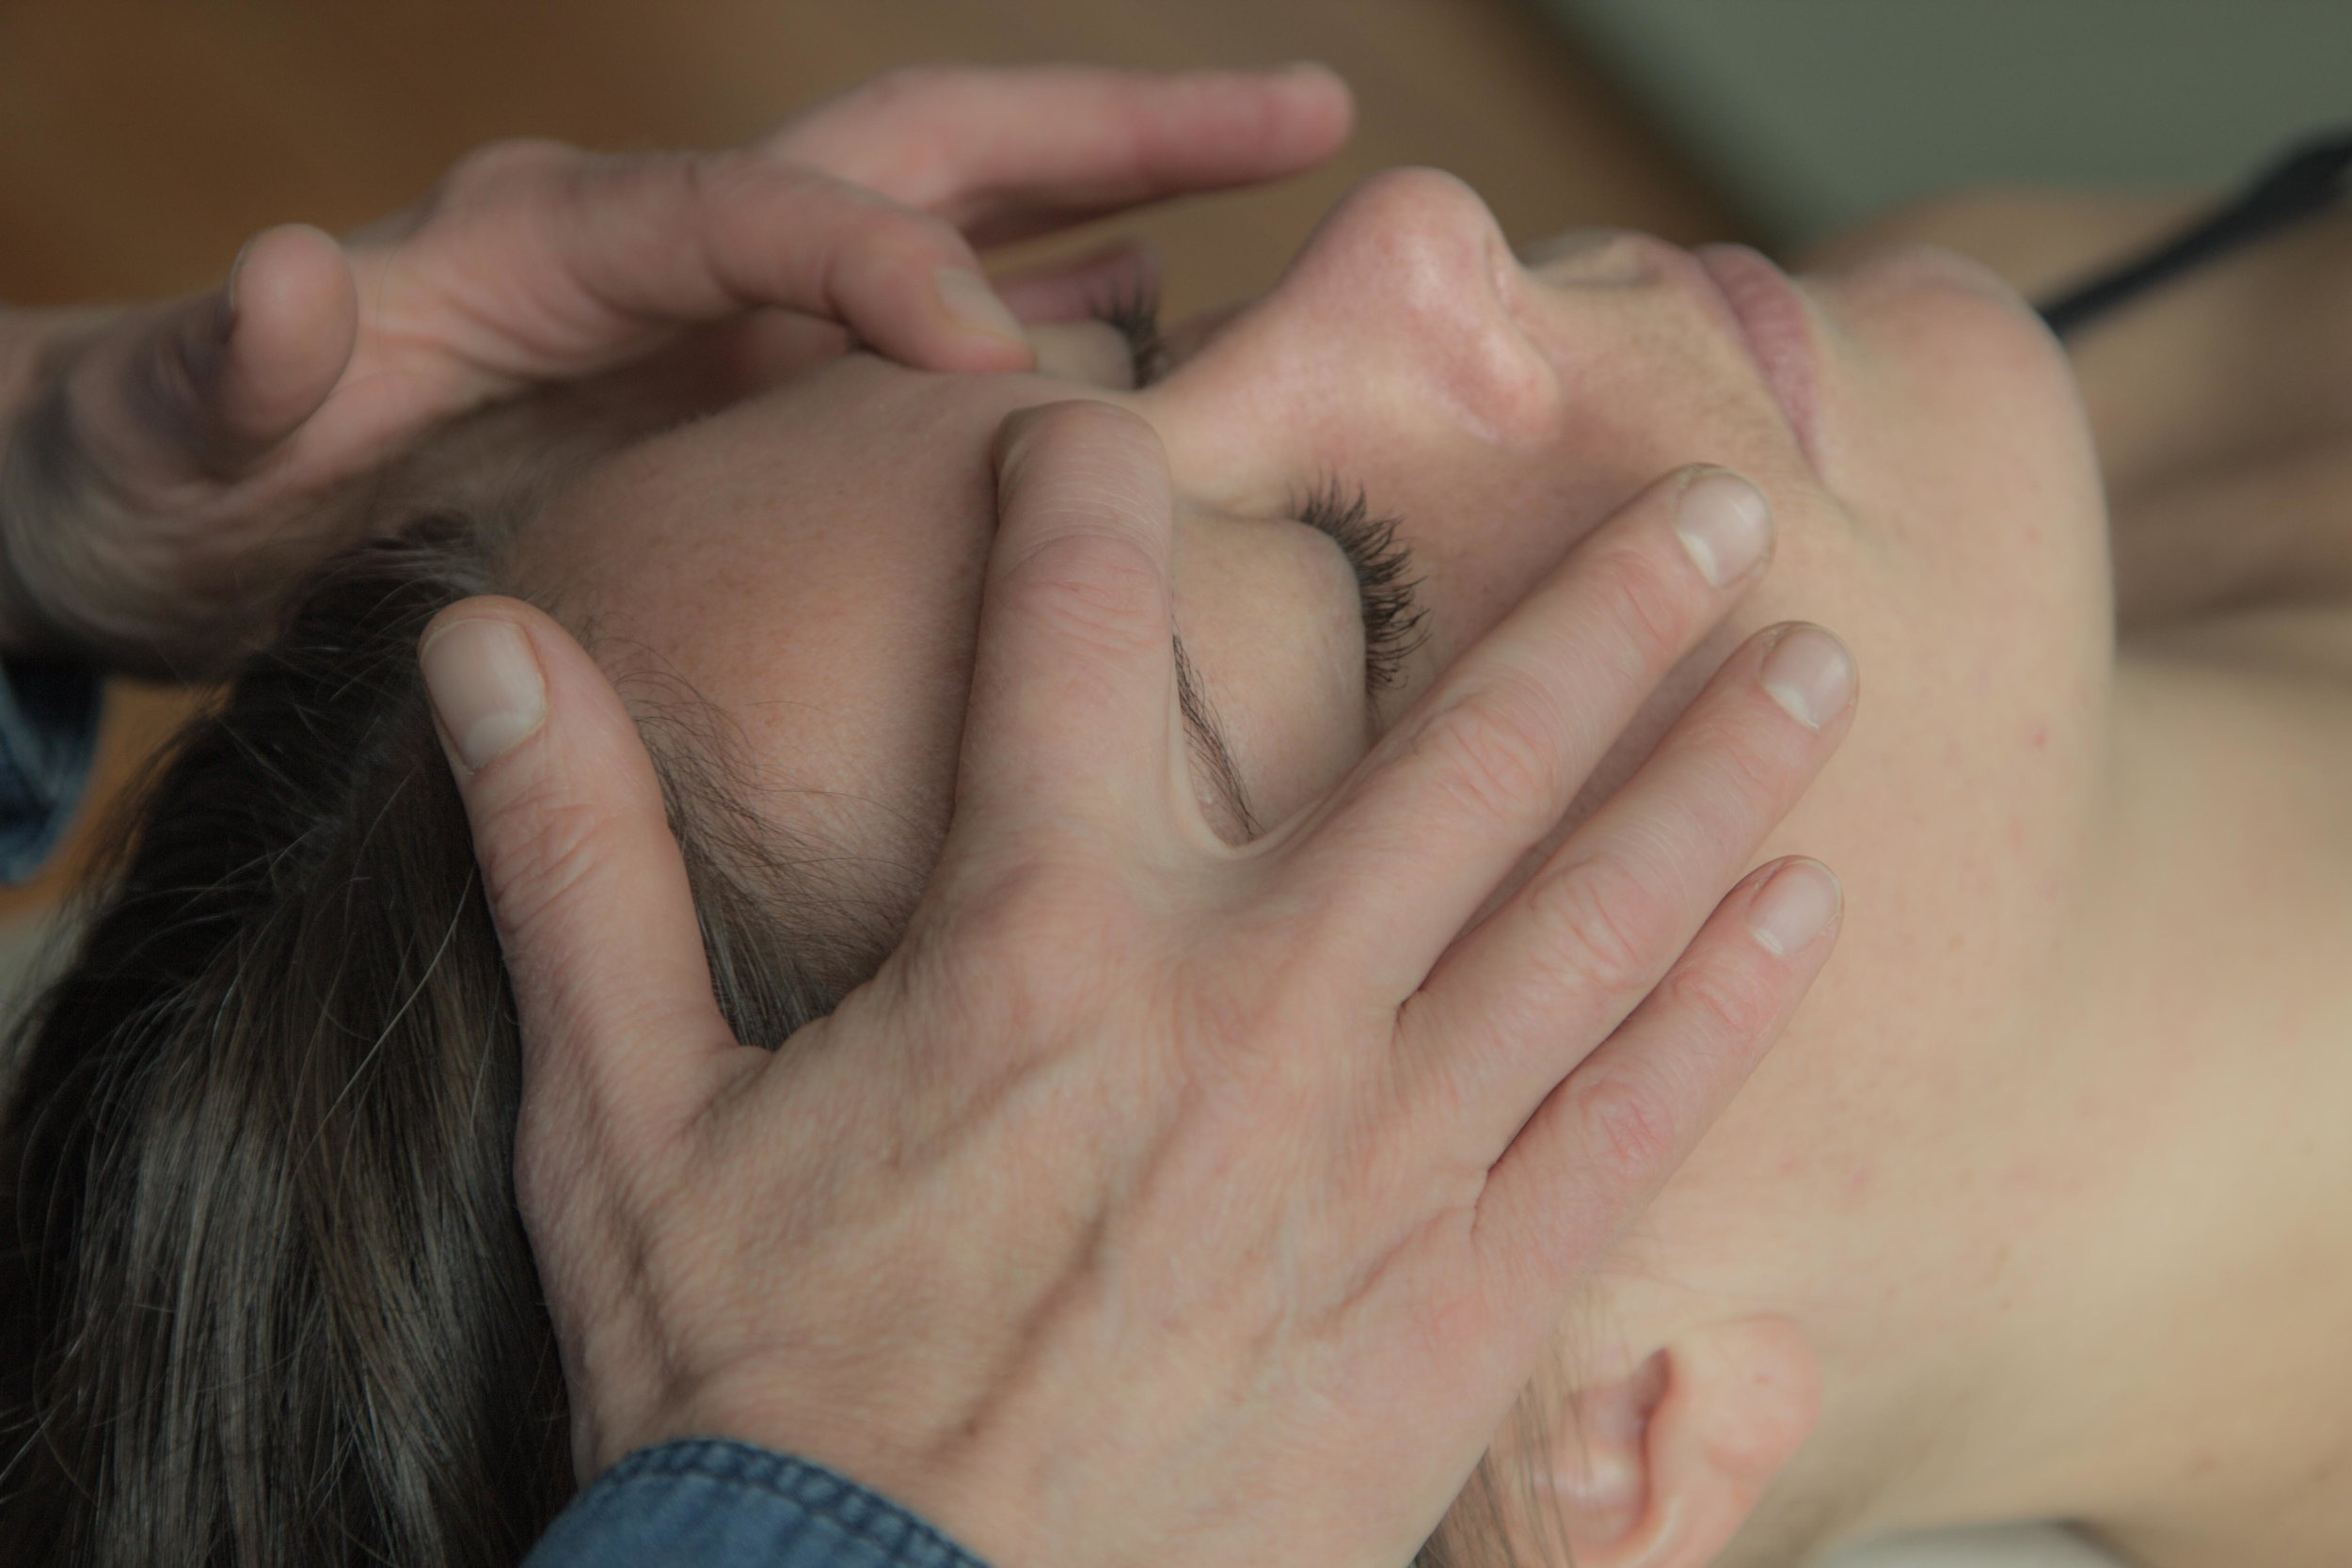 Zoneterapi behandling i ansigtet.